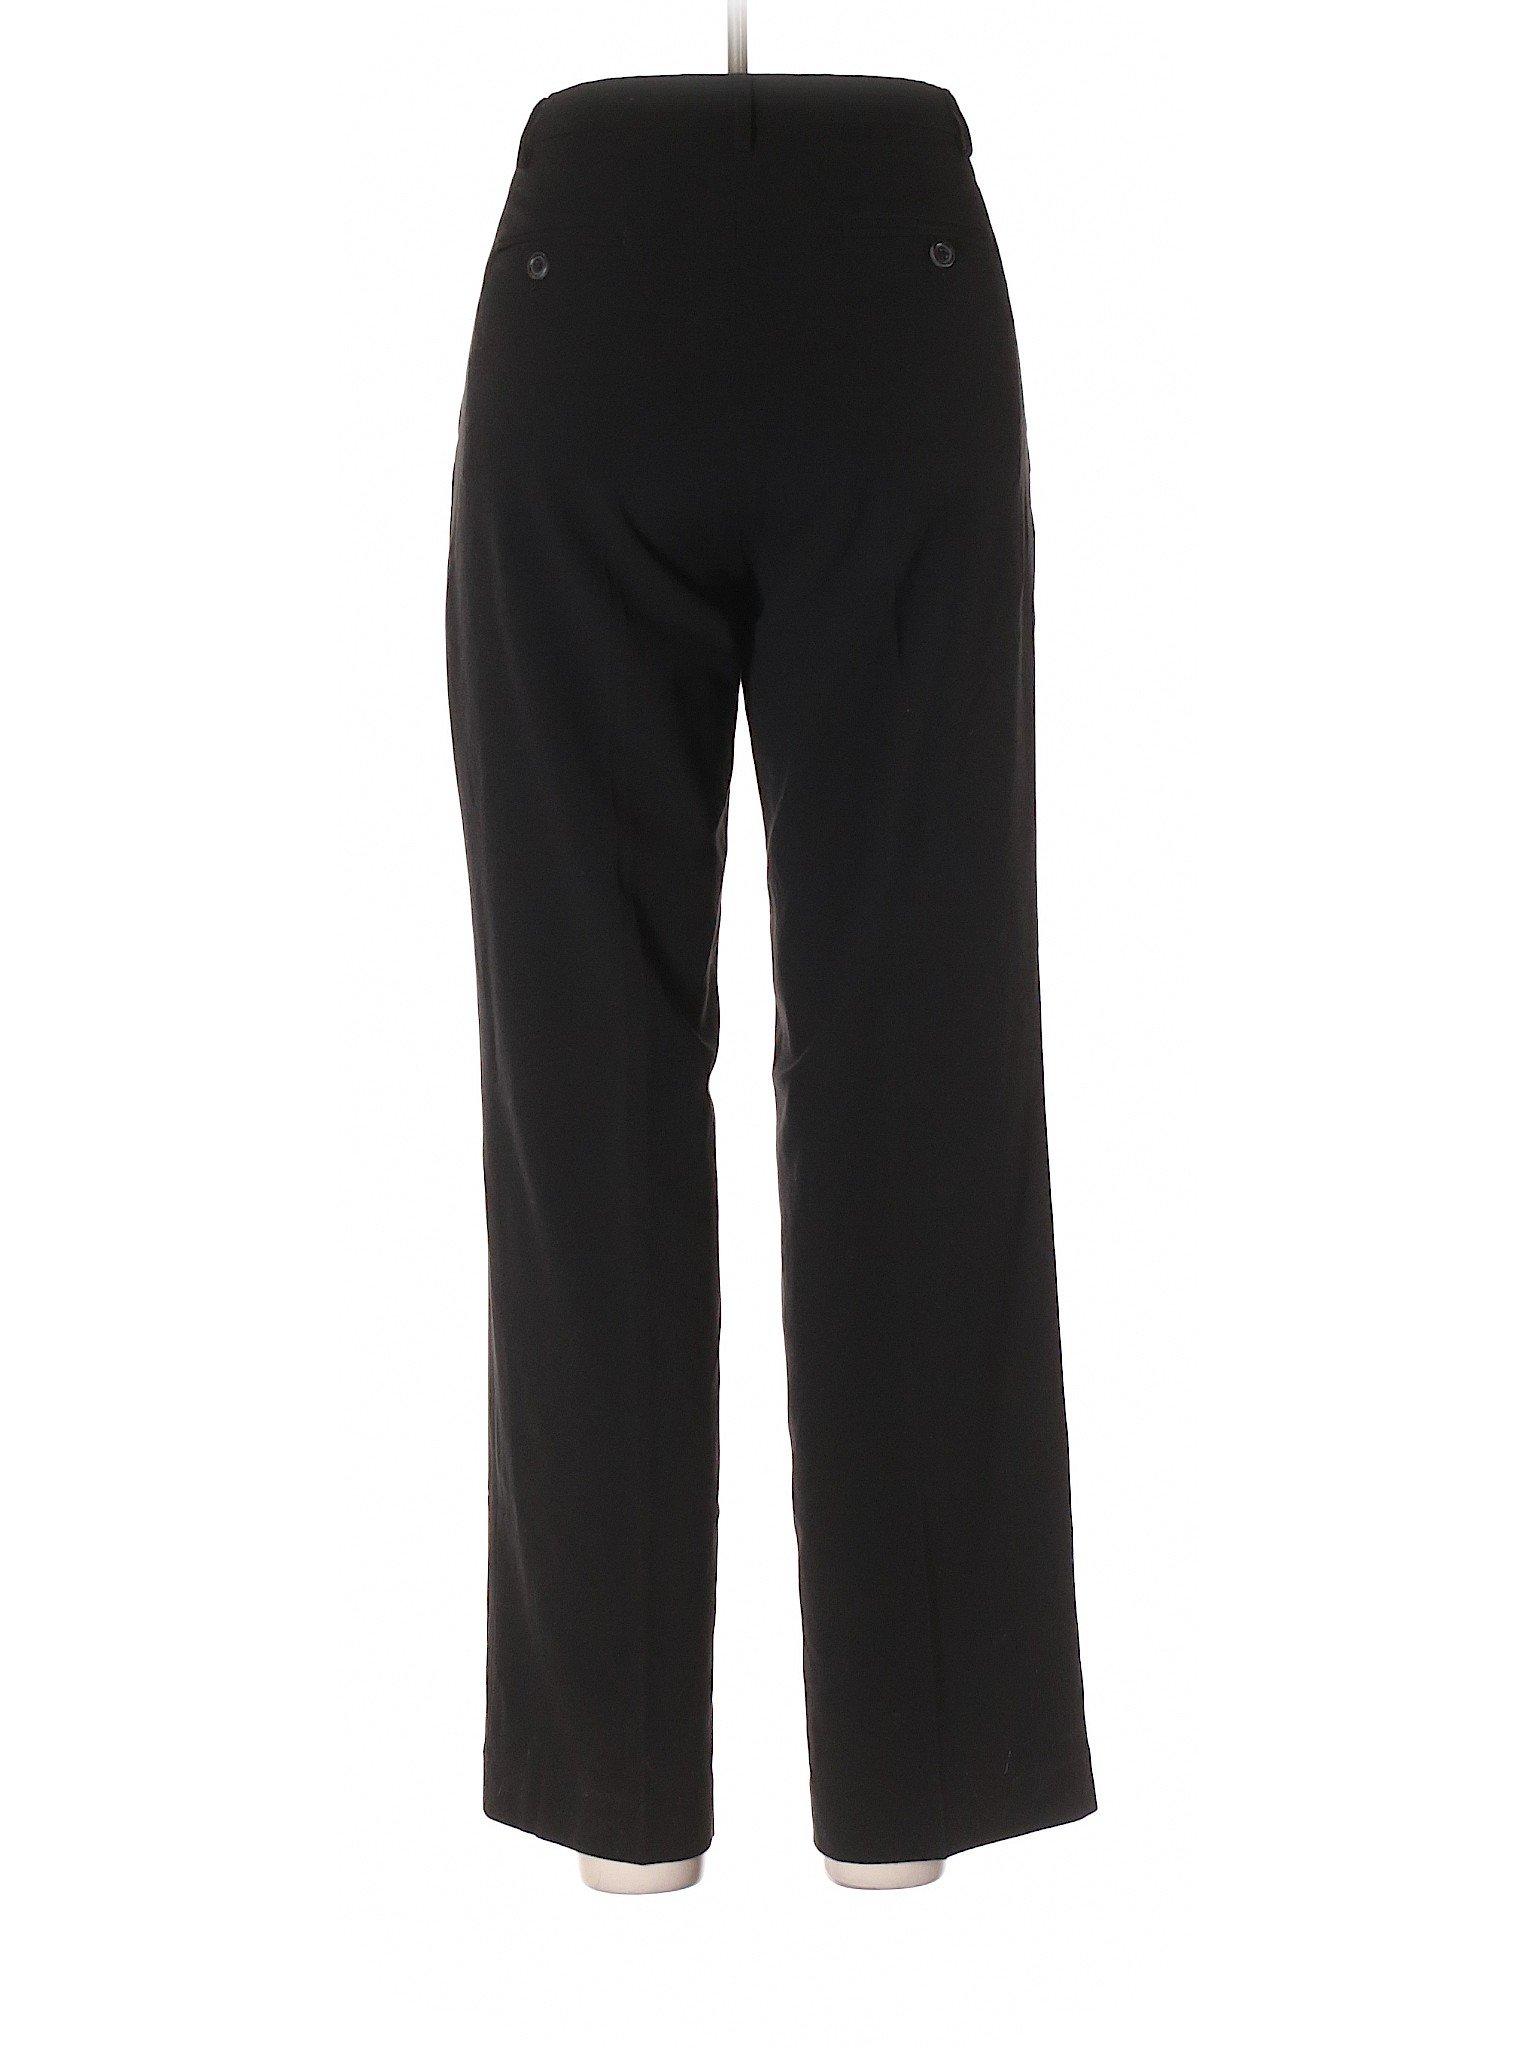 Calvin Calvin Dress Klein Pants Klein Boutique Dress Pants Klein Pants Boutique Dress Boutique Calvin CRgqxtF